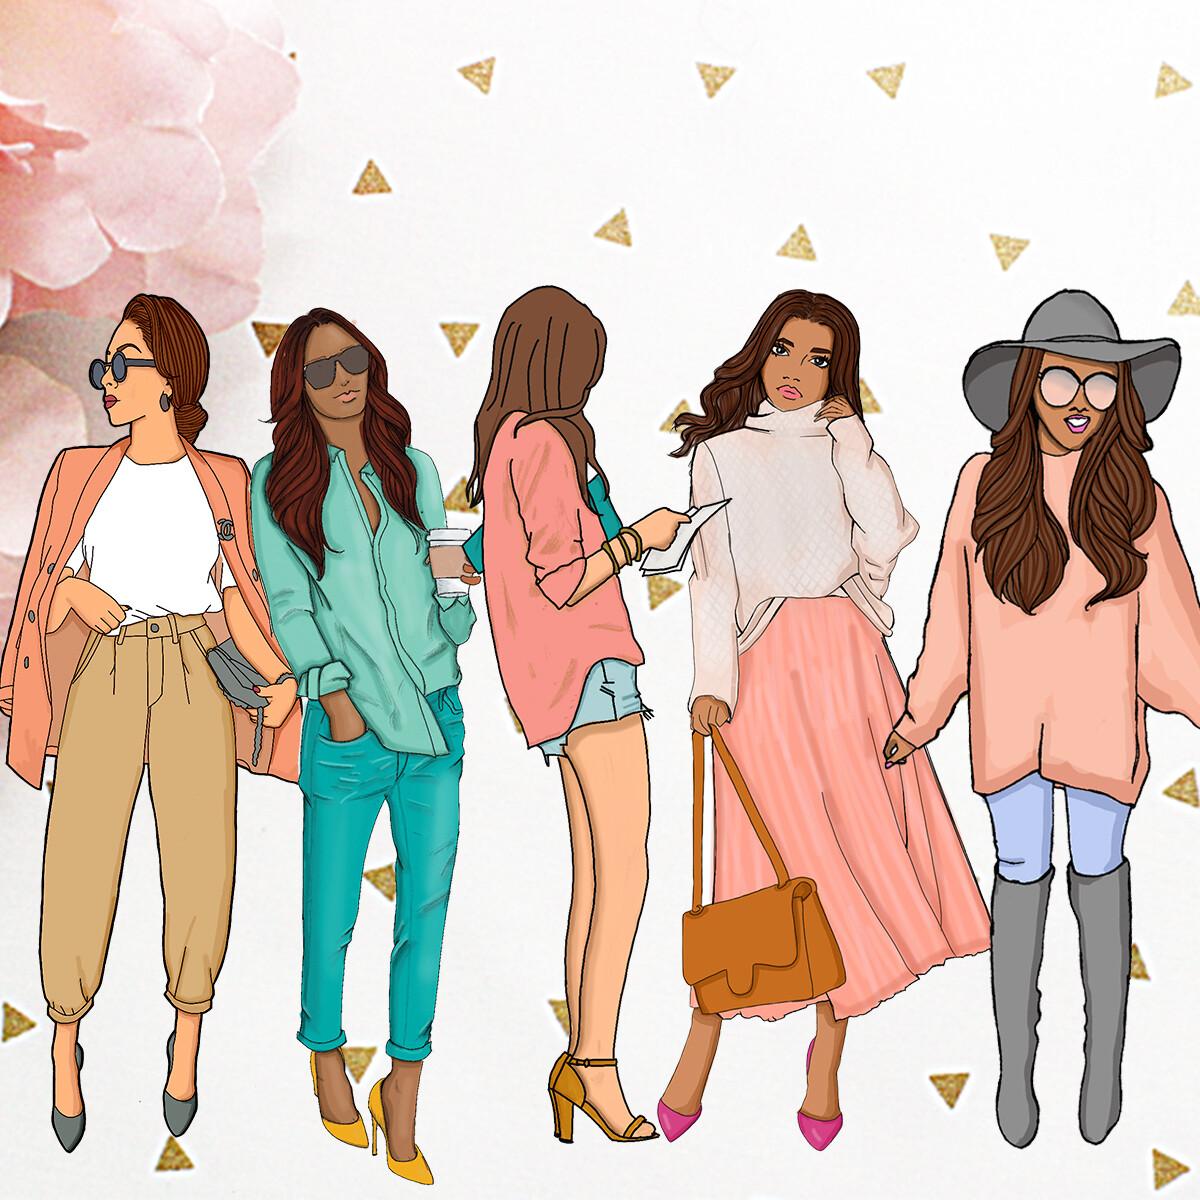 Illustrated Girls Set #1